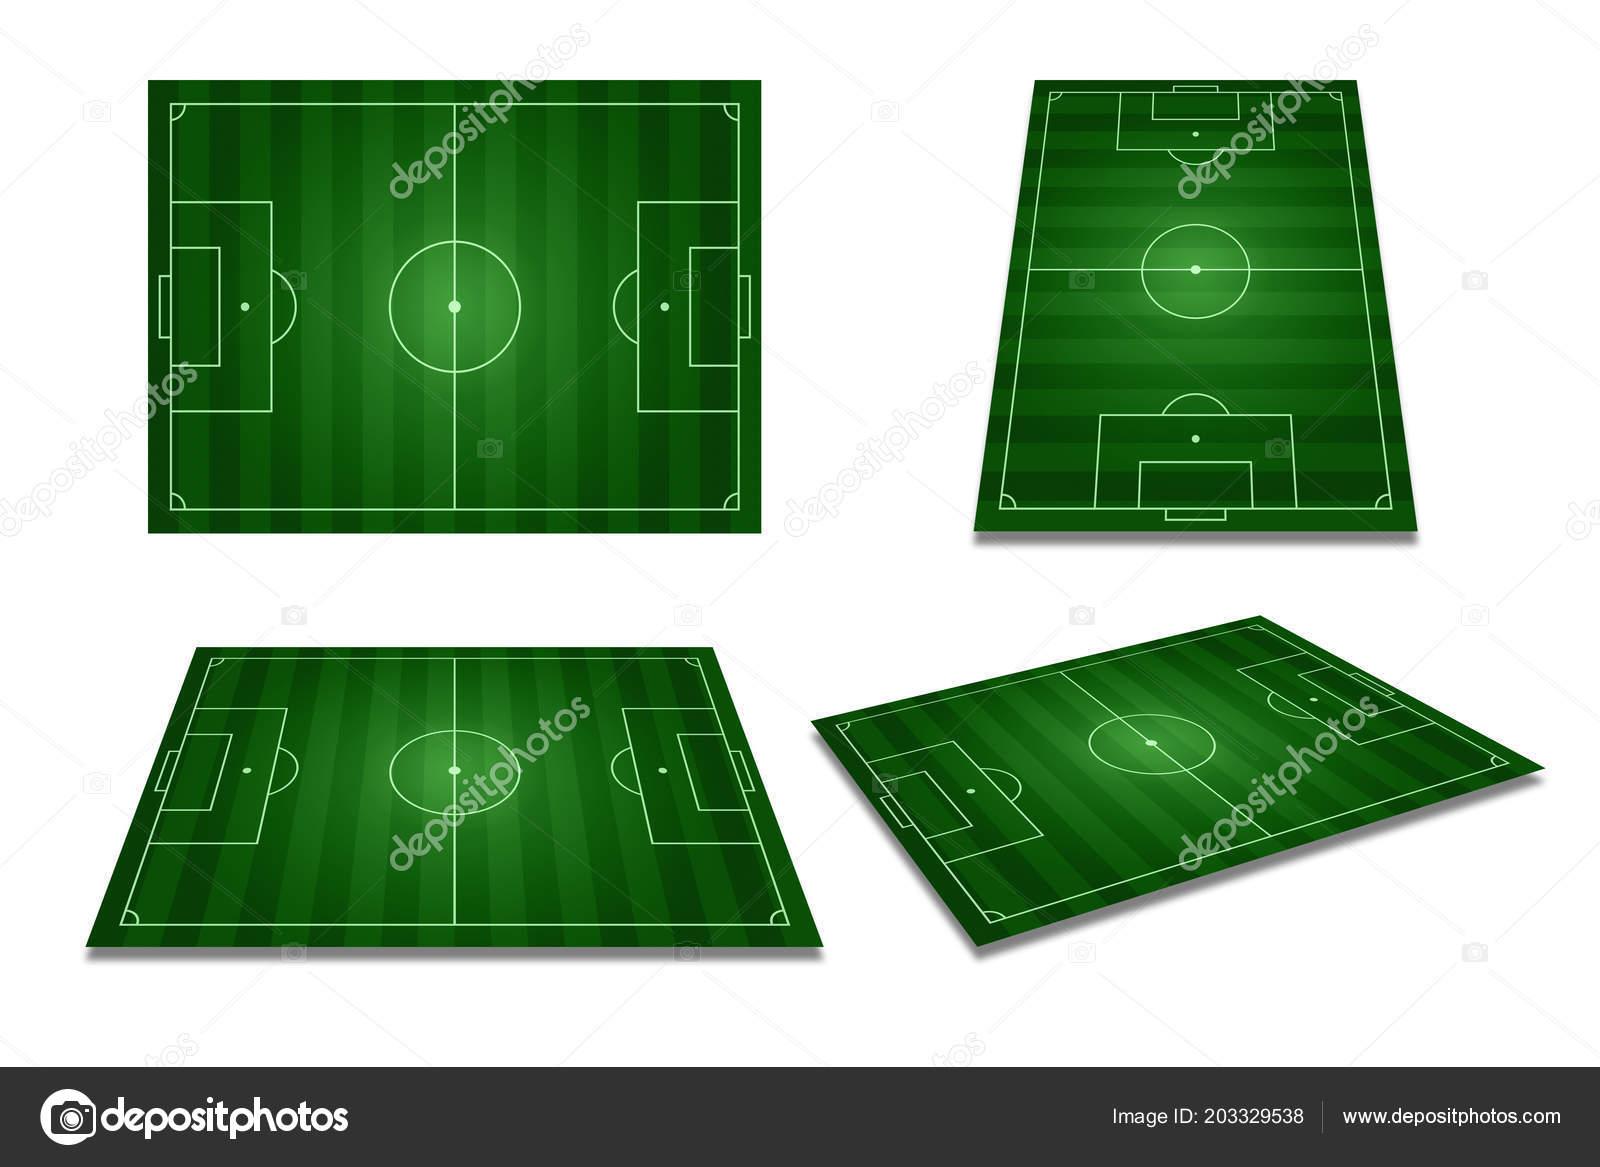 Perspectiva Diferente Verde Campo Futebol Campo Futebol Vista Superior —  Fotografia de Stock d7b55c751313d